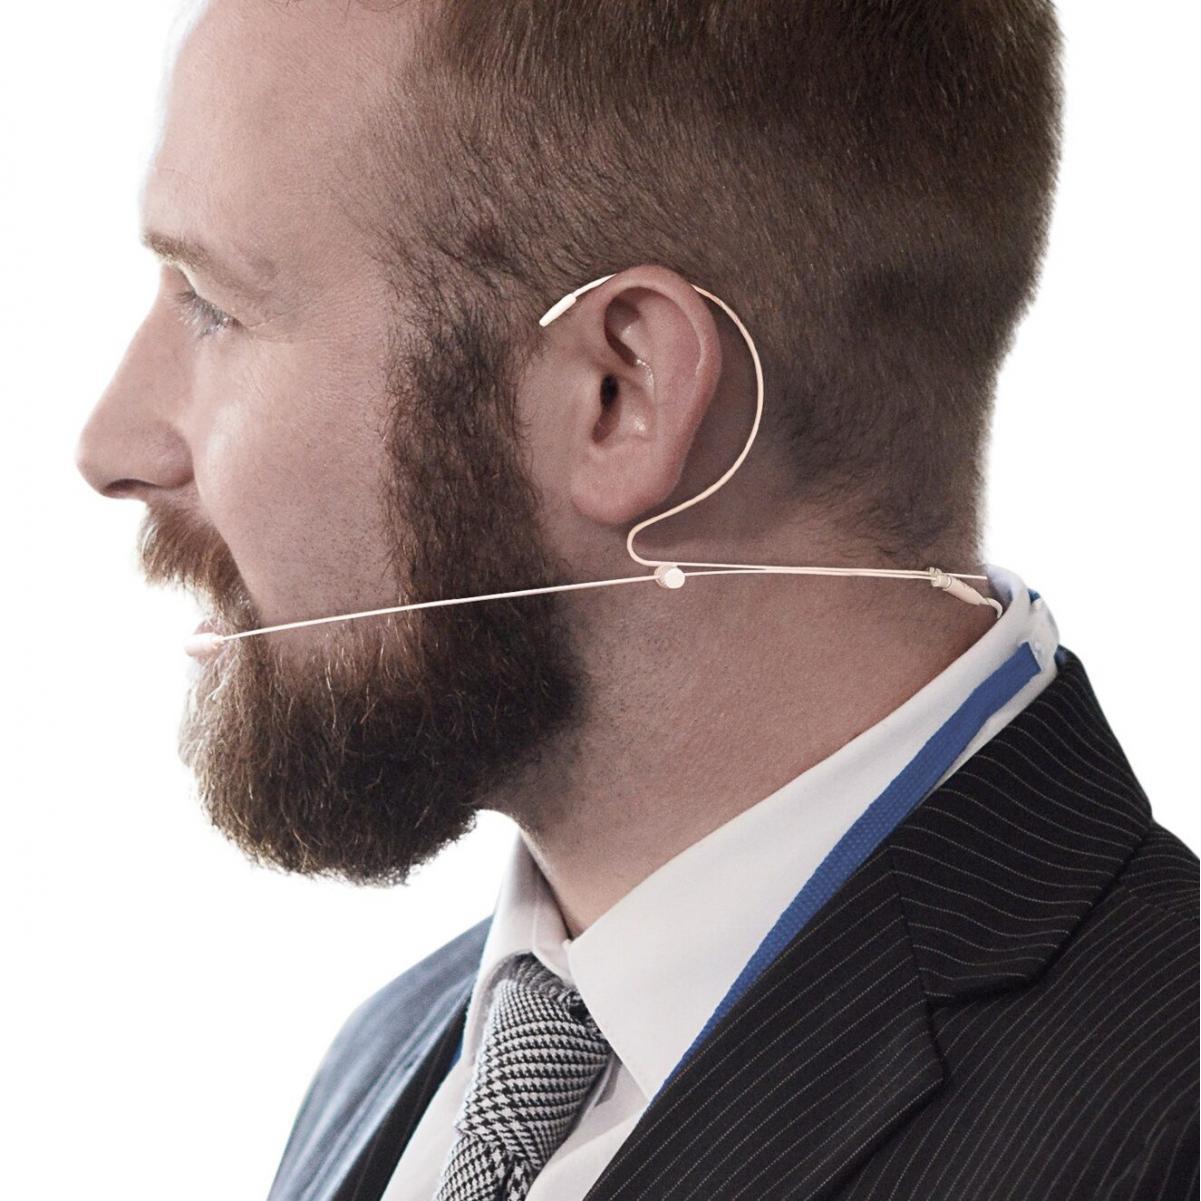 Saramonic DK6A headphone with mini jack connector